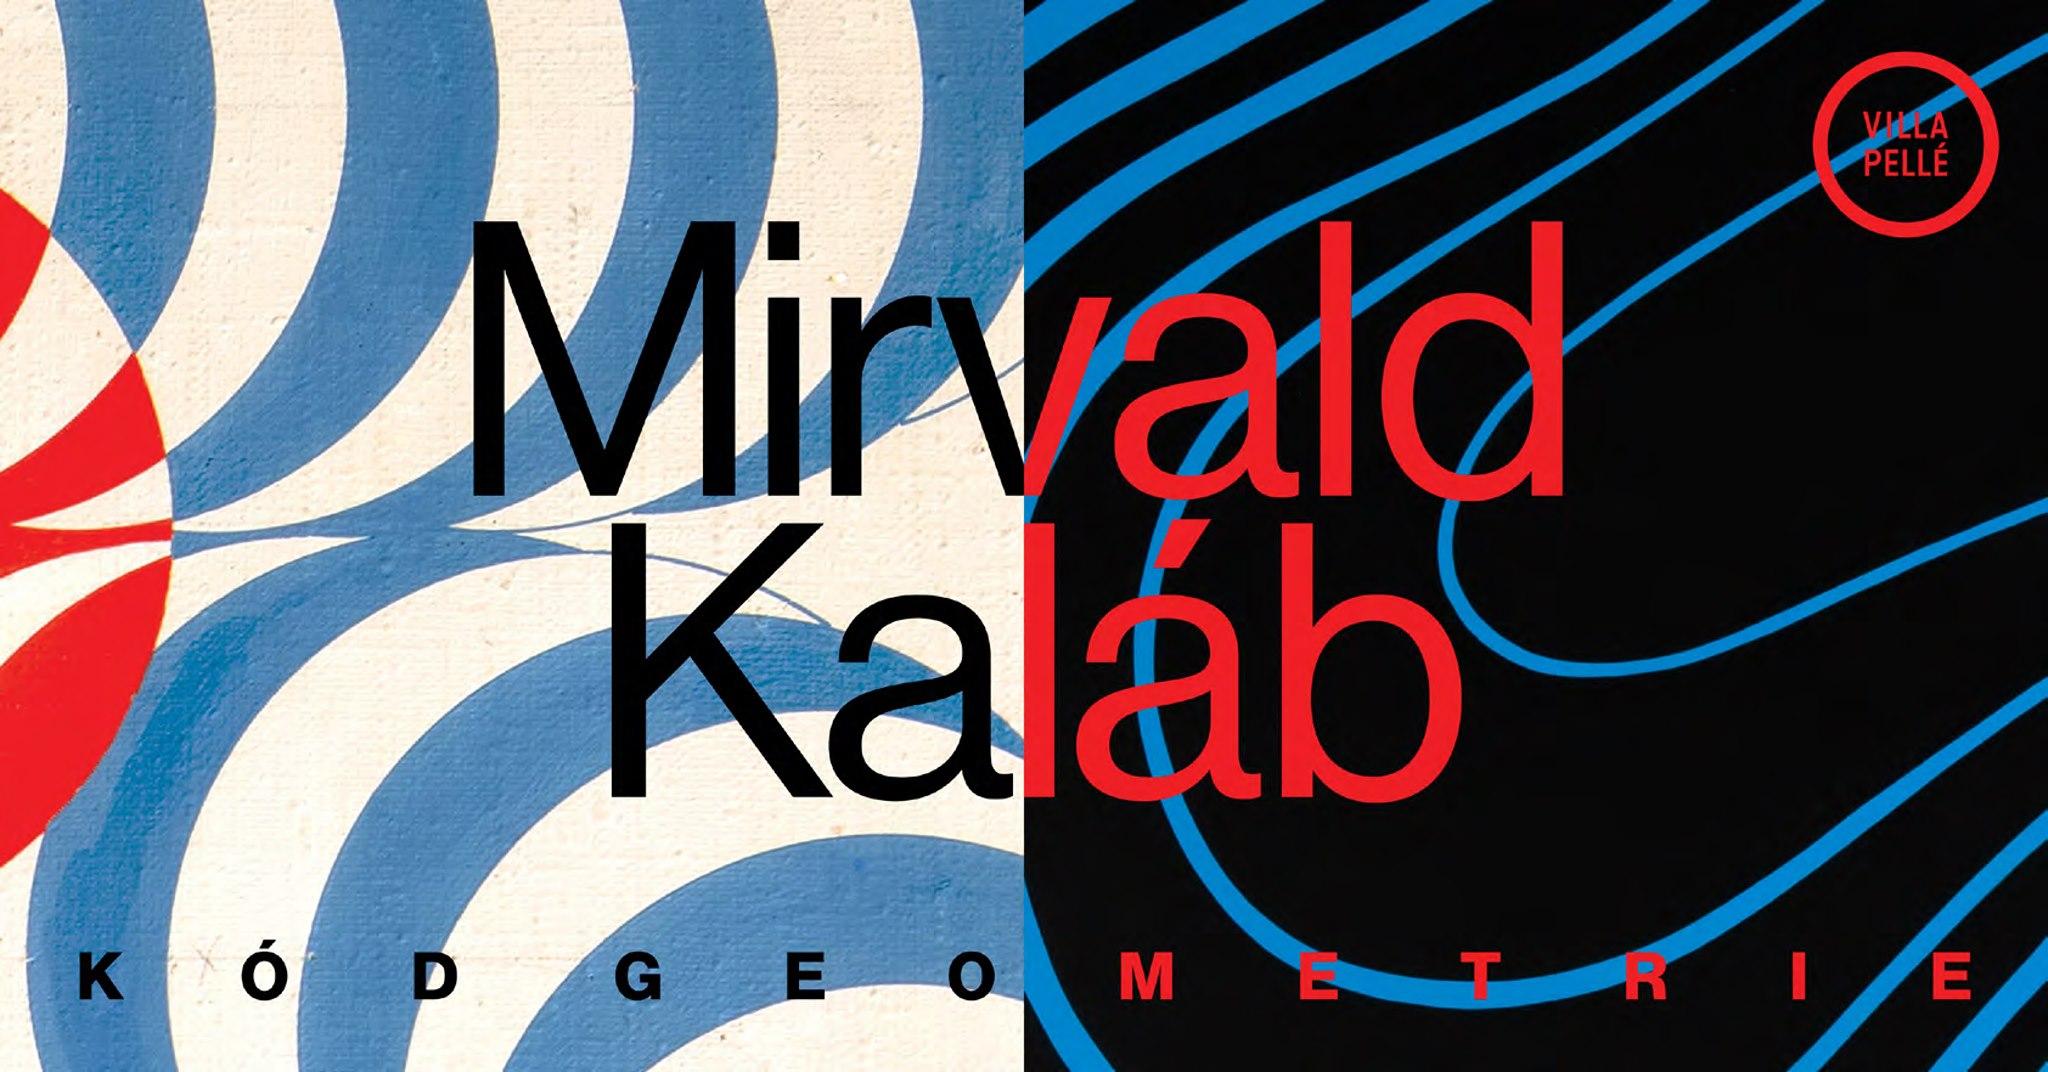 KÓD GEOMETRIE - Vladislav Mirvald & Jan Kaláb